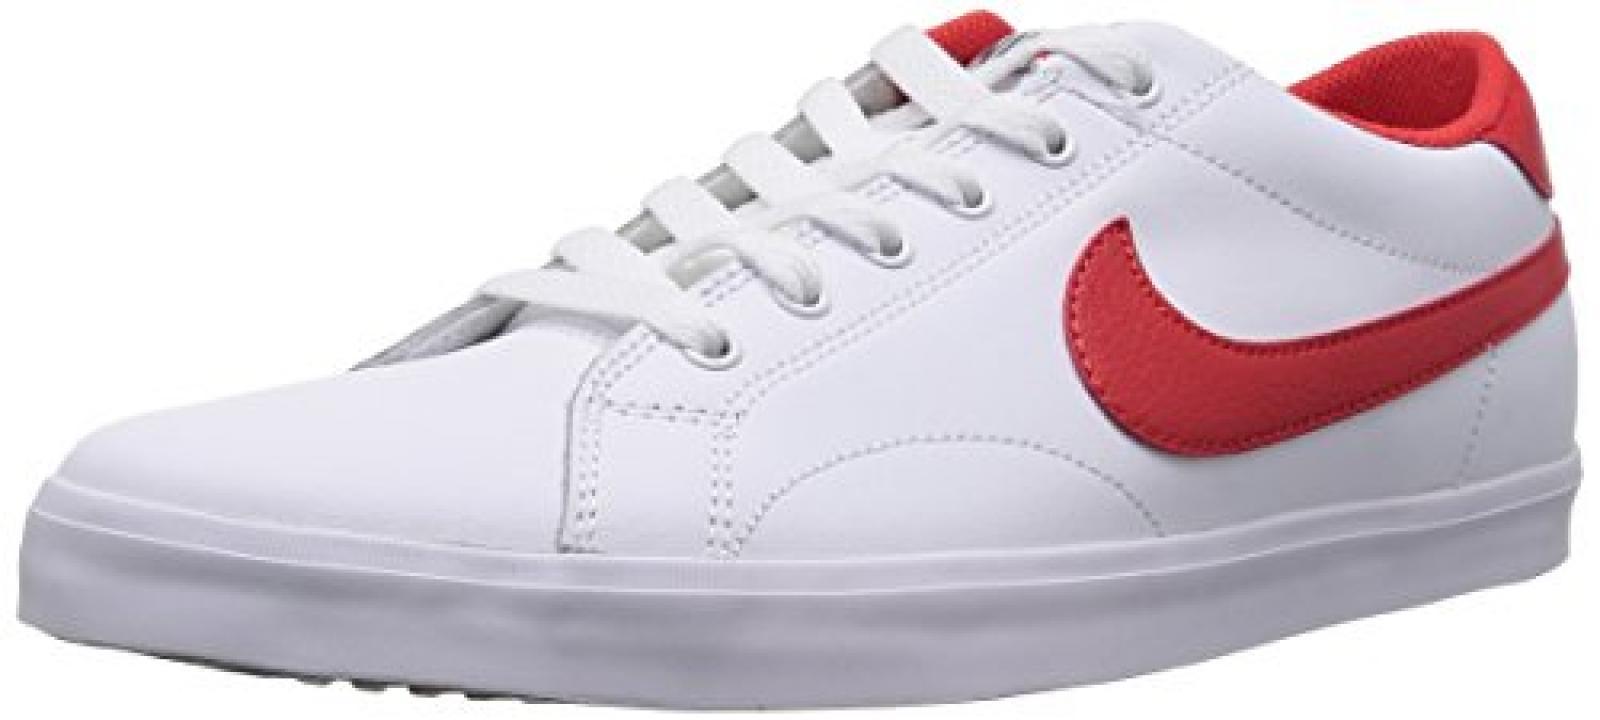 Nike 555244 018 Eastham Herren Sportschuhe - Running